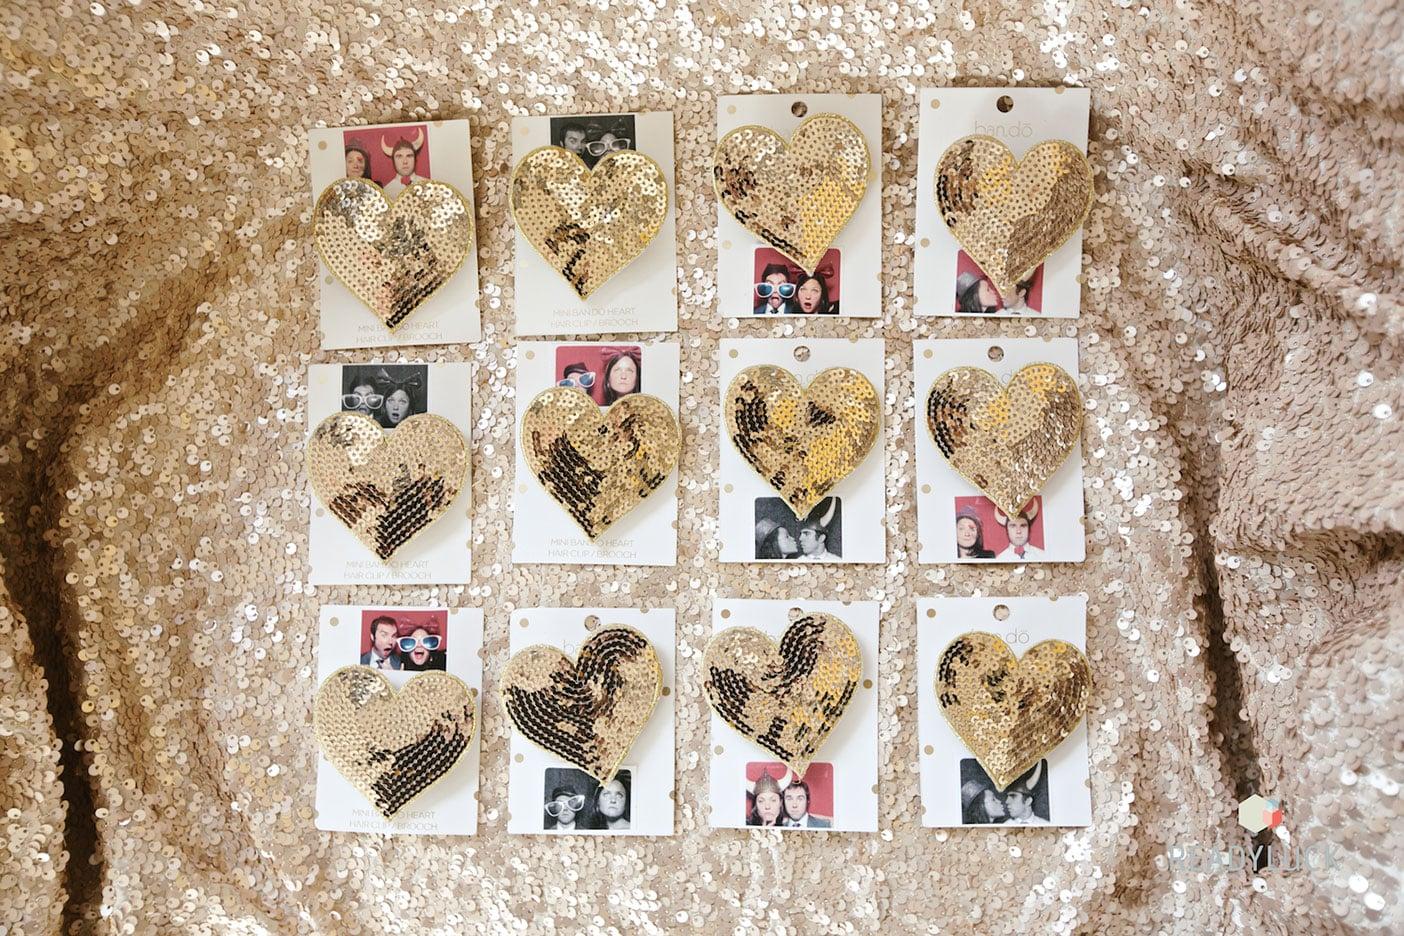 Gold sequin heart wedding favors | Industrial warehouse wedding in Fishtown Philadelphia at Front & Palmer | Wedding planner & wedding design: Heart & Dash | Photo: Readyluck | Flowers: Vault + Vine